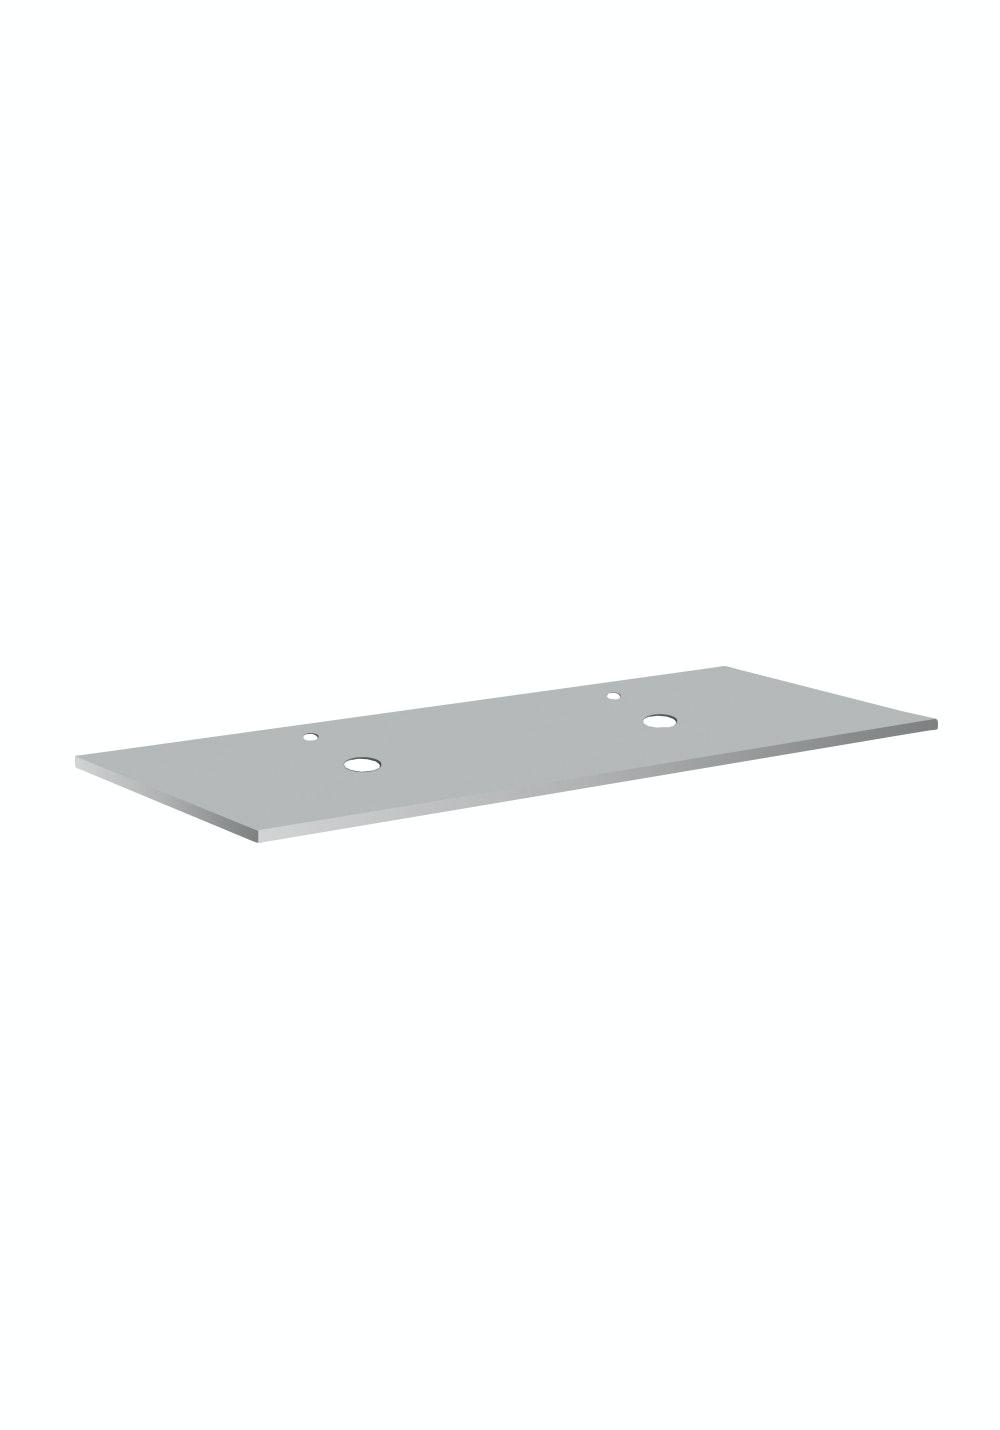 Bänkskiva Hafa Cemento Spa Suede 12x462x1210mm Två Hål